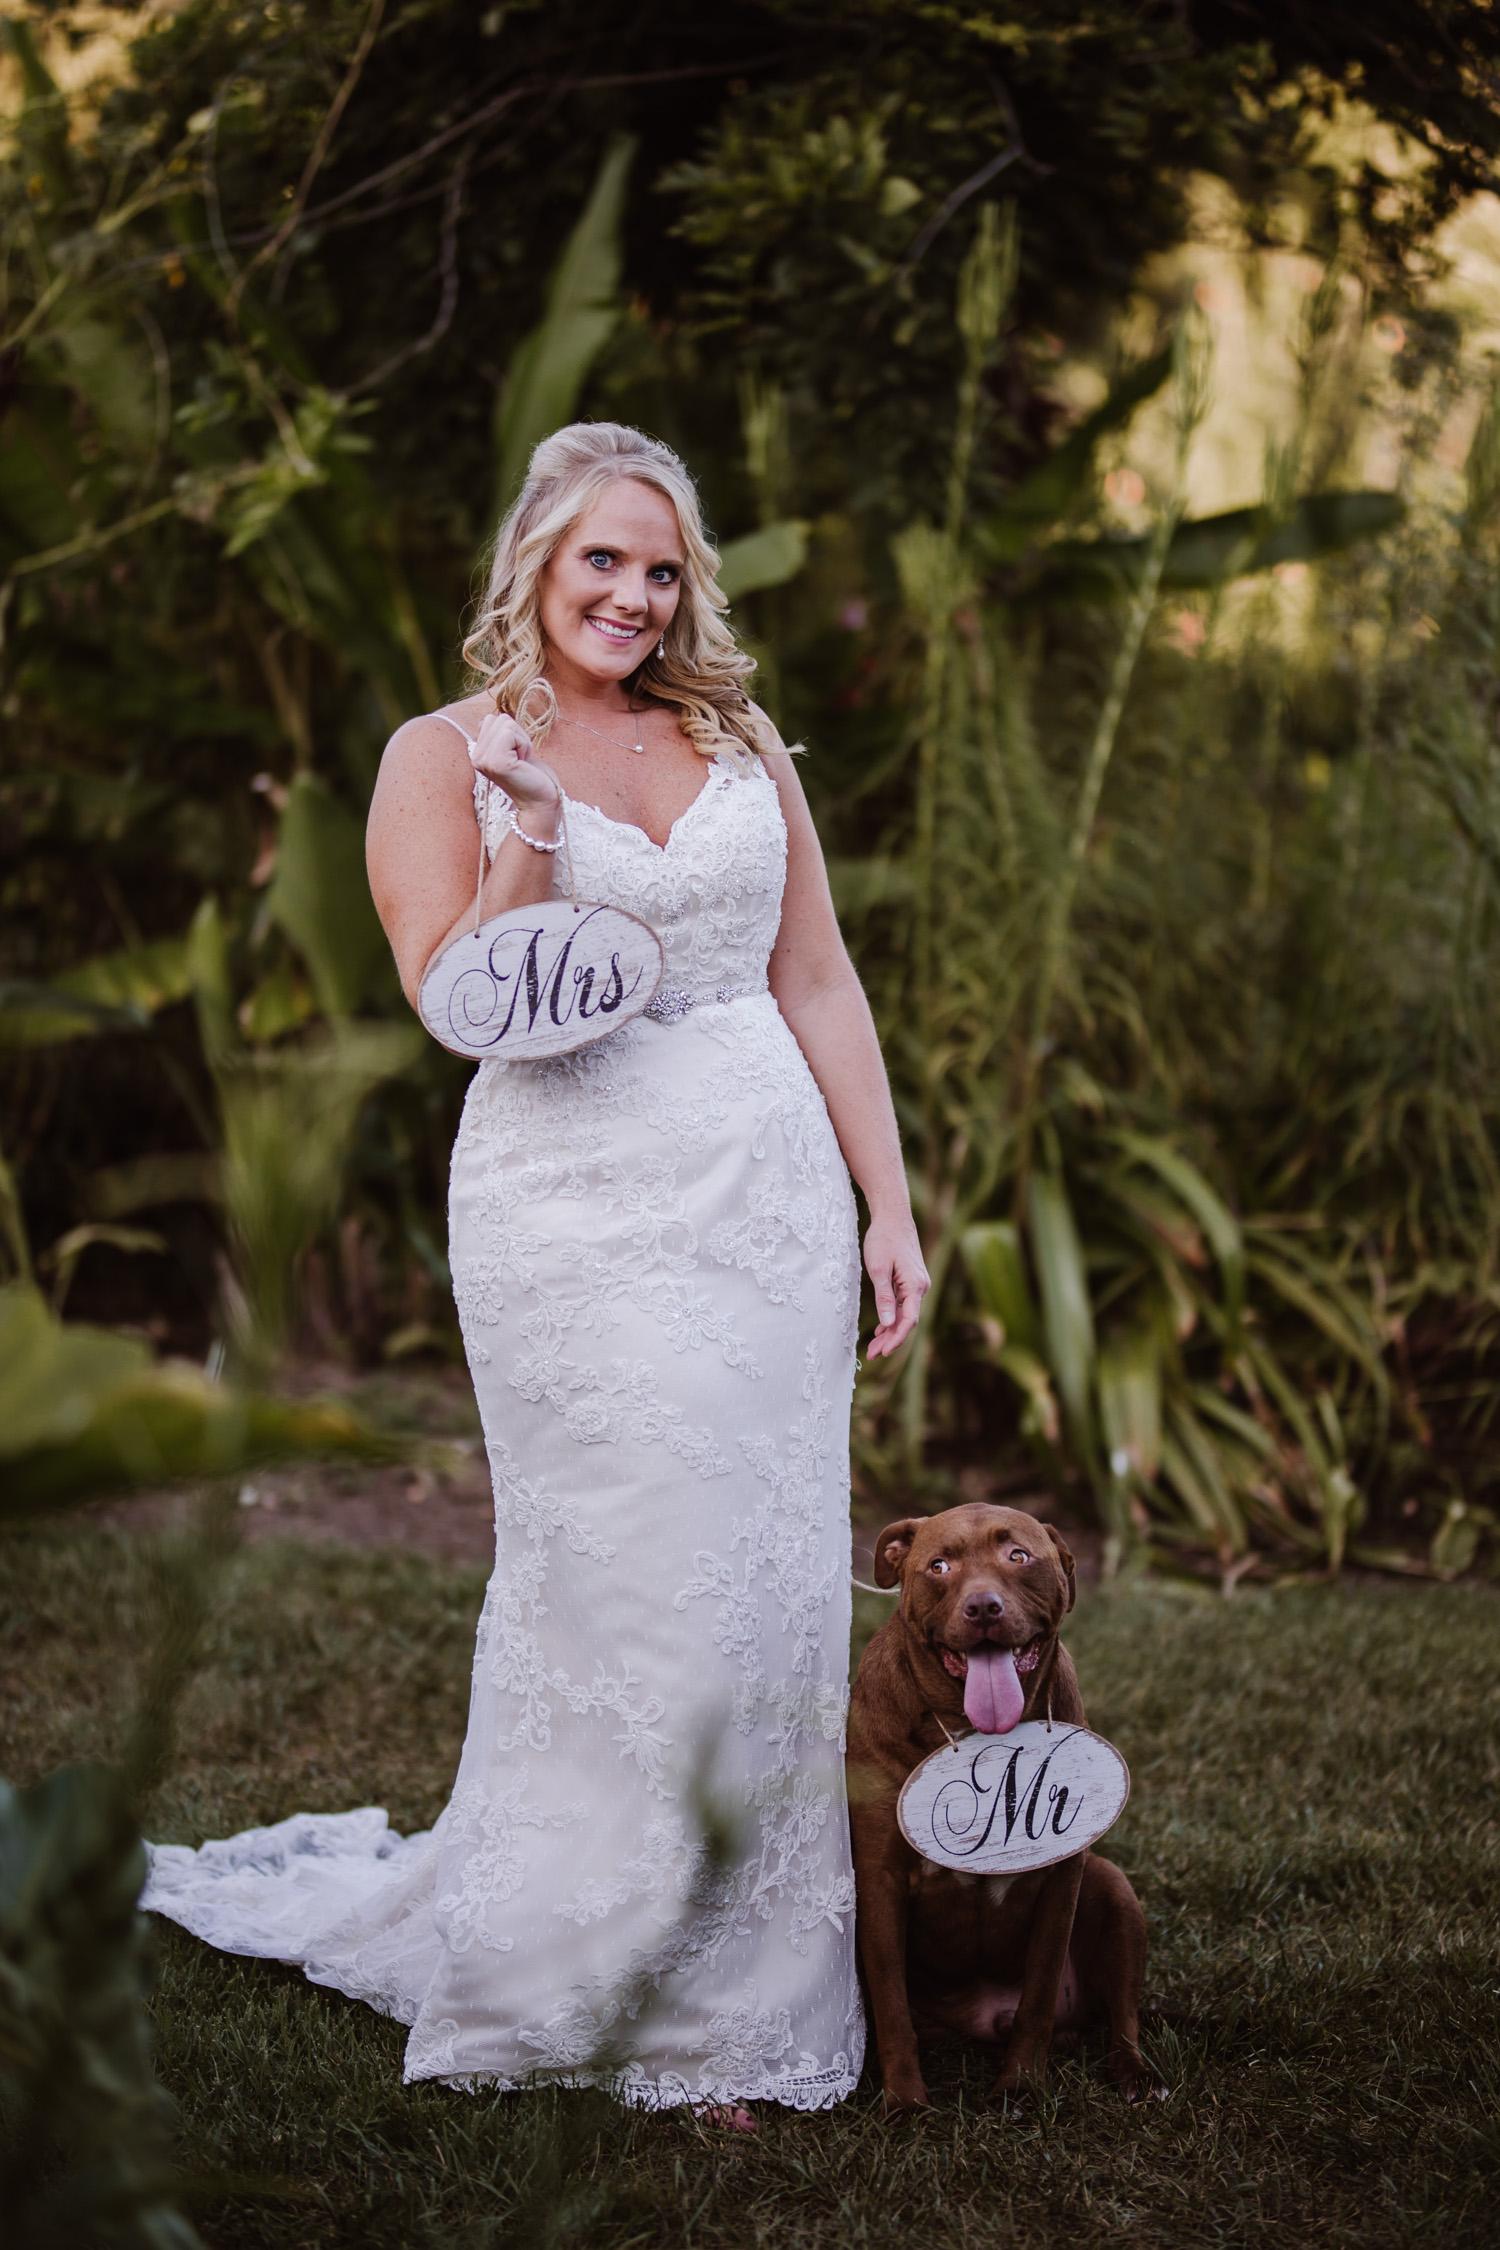 Kristina's garden Bridal Portraits with dog | Triad, NC Wedding Photographer | Kayli LaFon Photography